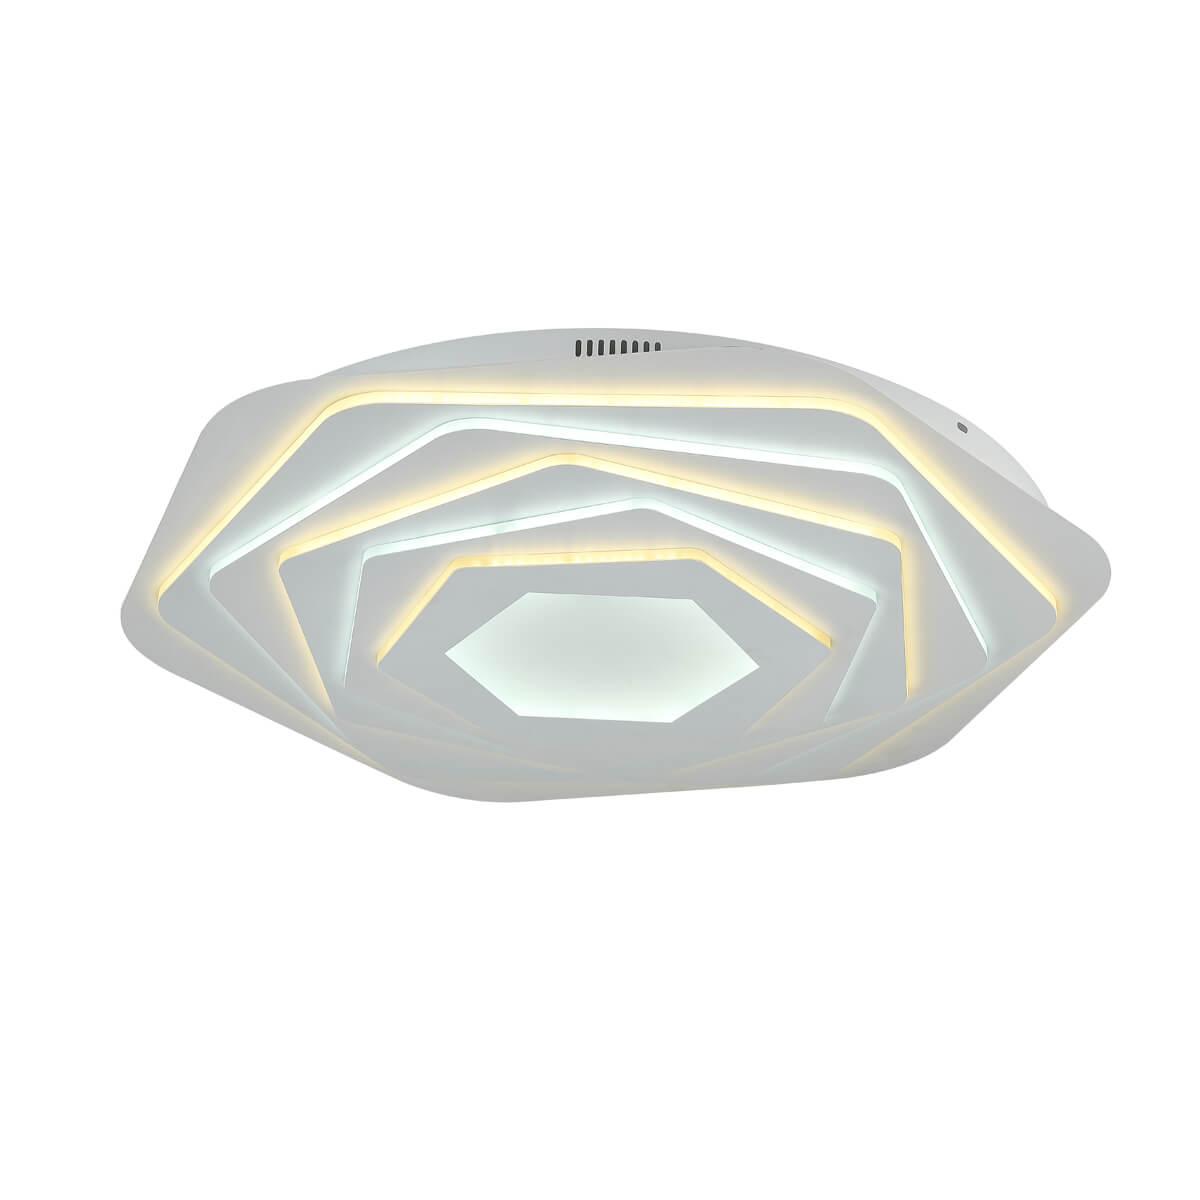 Светильник F-Promo 2289-8C Ledolution светильник natali kovaltseva 10714 8c toon